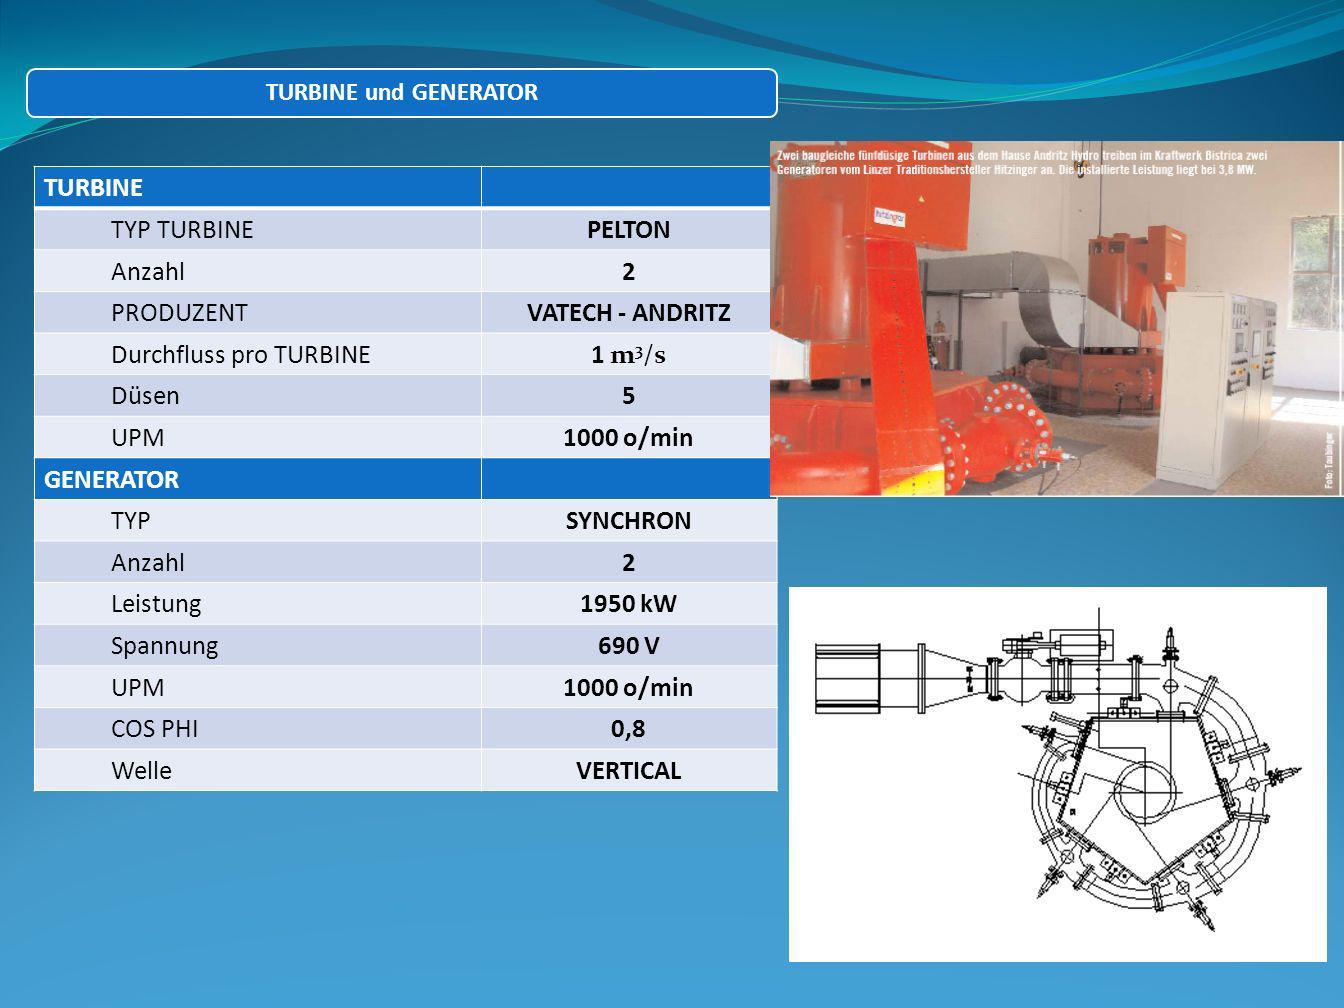 TURBINE TYP TURBINEPELTON Anzahl2 PRODUZENTVATECH - ANDRITZ Durchfluss pro TURBINE1 m 3 /s Düsen5 UPM1000 o/min GENERATOR TYPSYNCHRON Anzahl2 Leistung1950 kW Spannung690 V UPM1000 o/min COS PHI0,8 WelleVERTICAL TURBINE und GENERATOR